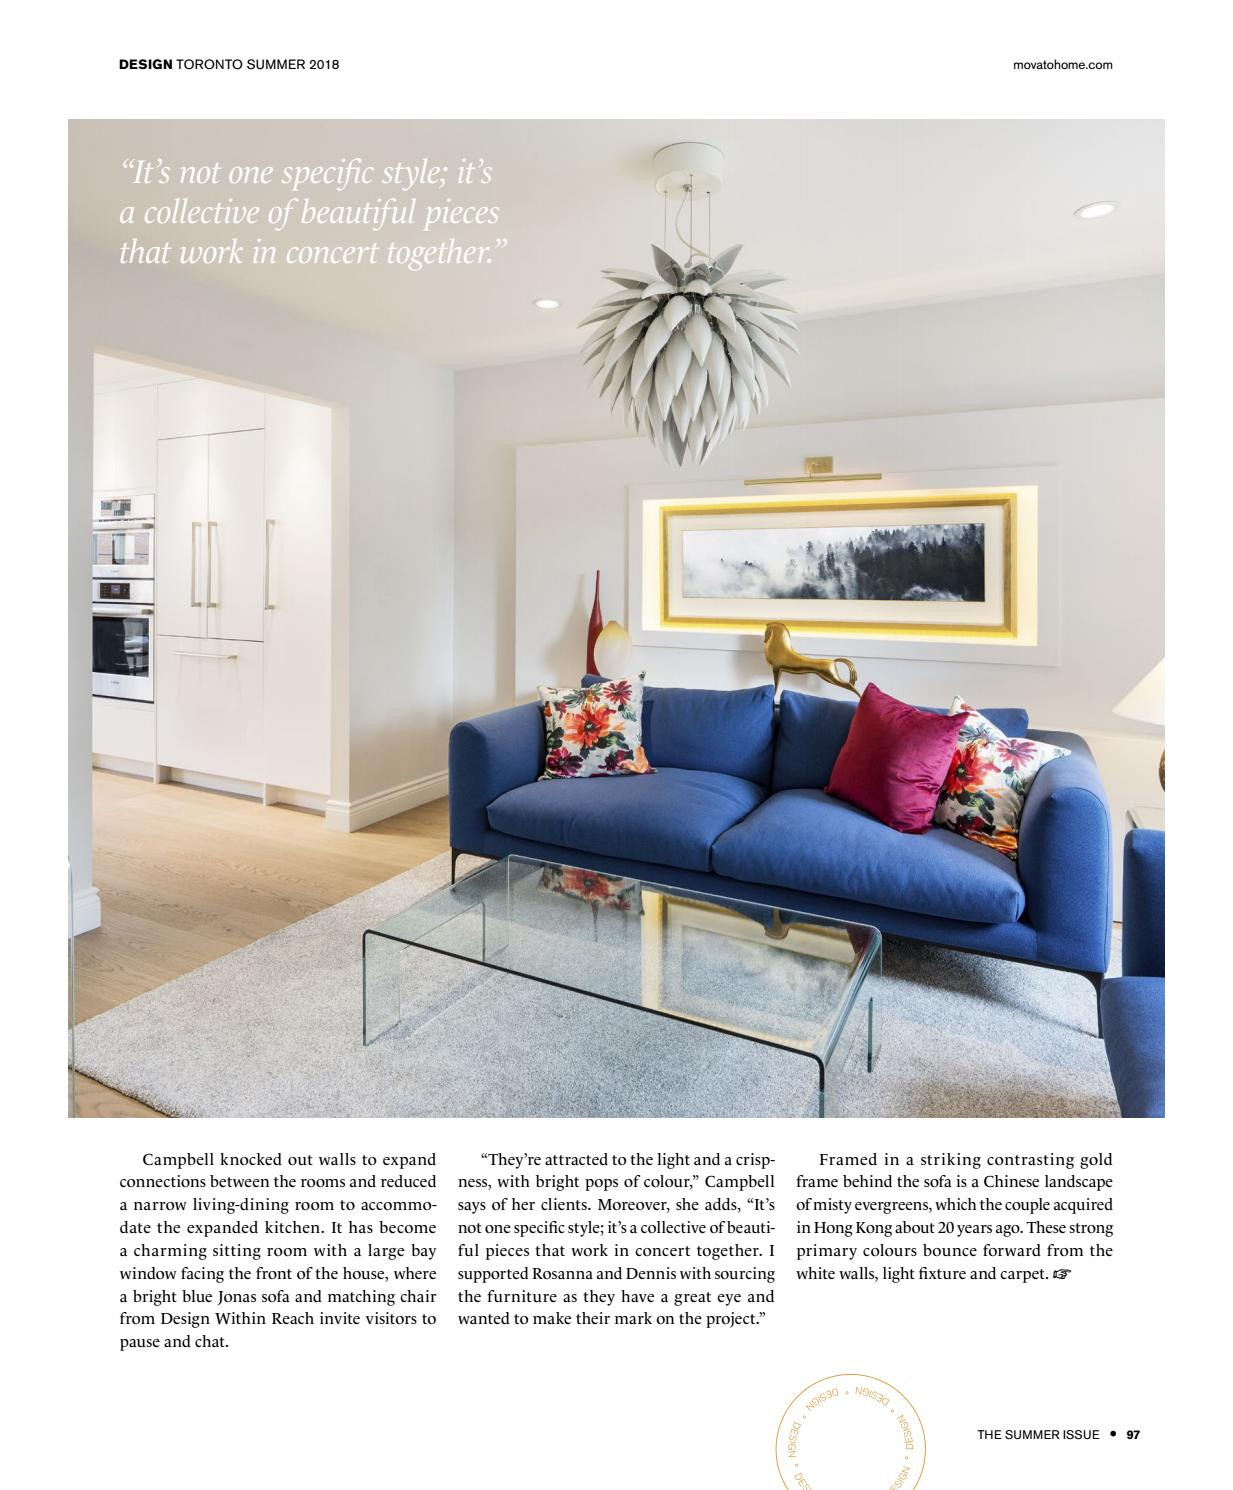 Home Decorating Jobs: Interior Design Summer Jobs Toronto